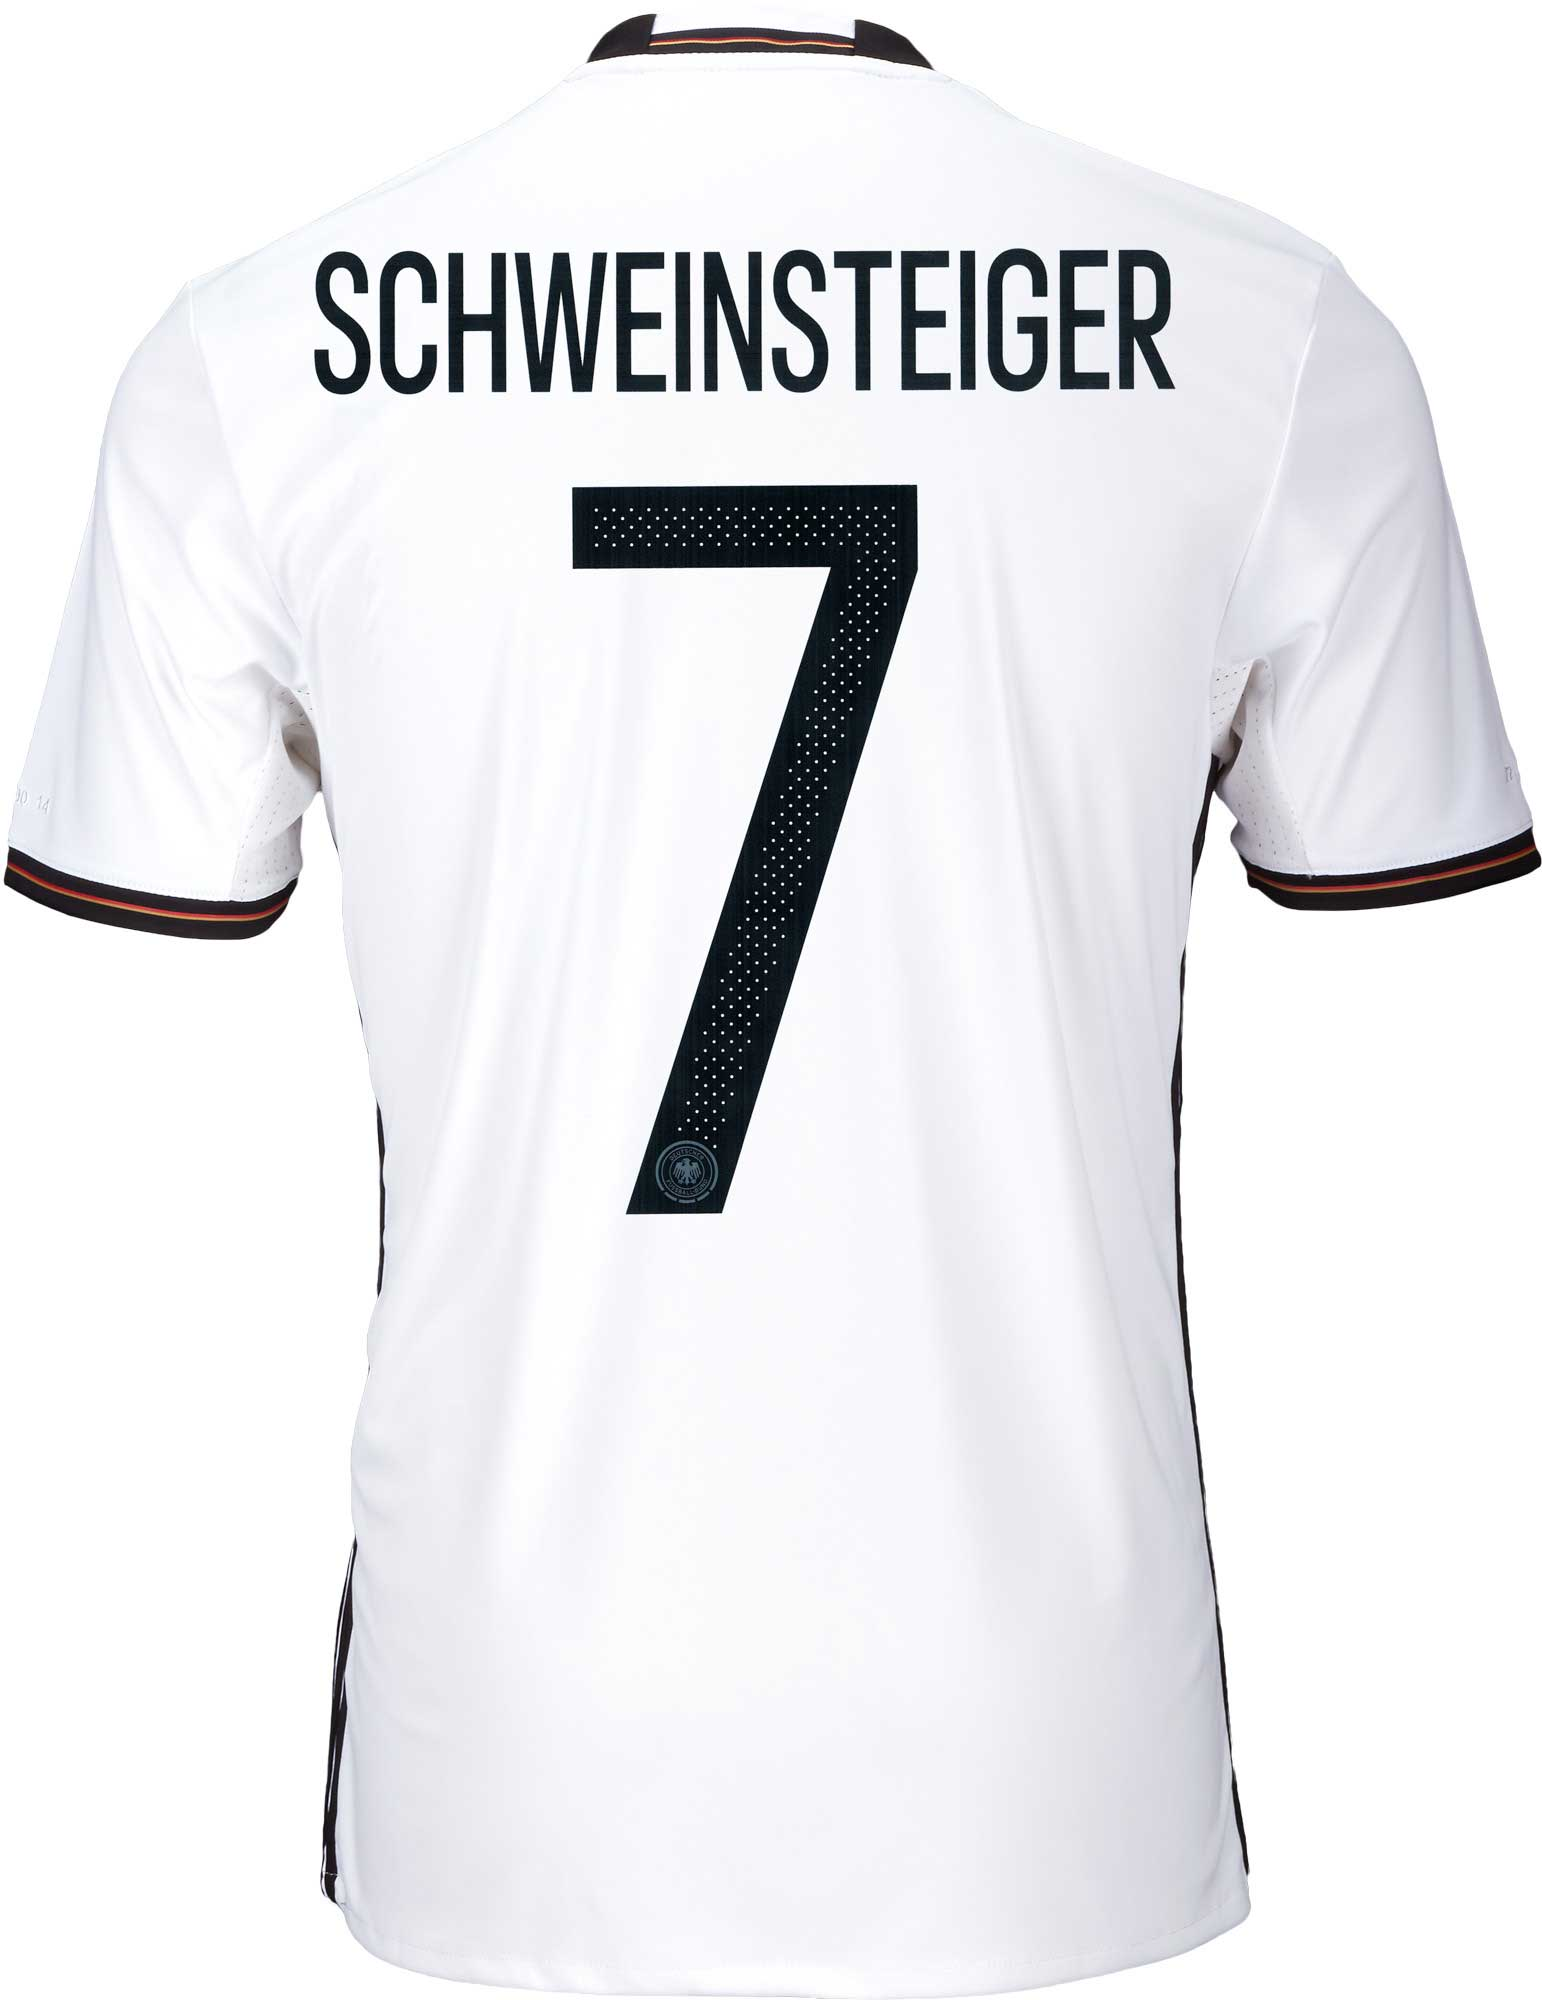 2be7f5e47e6 adidas Schweinsteiger Germany Home Jersey - 2016 Germany Jerseys